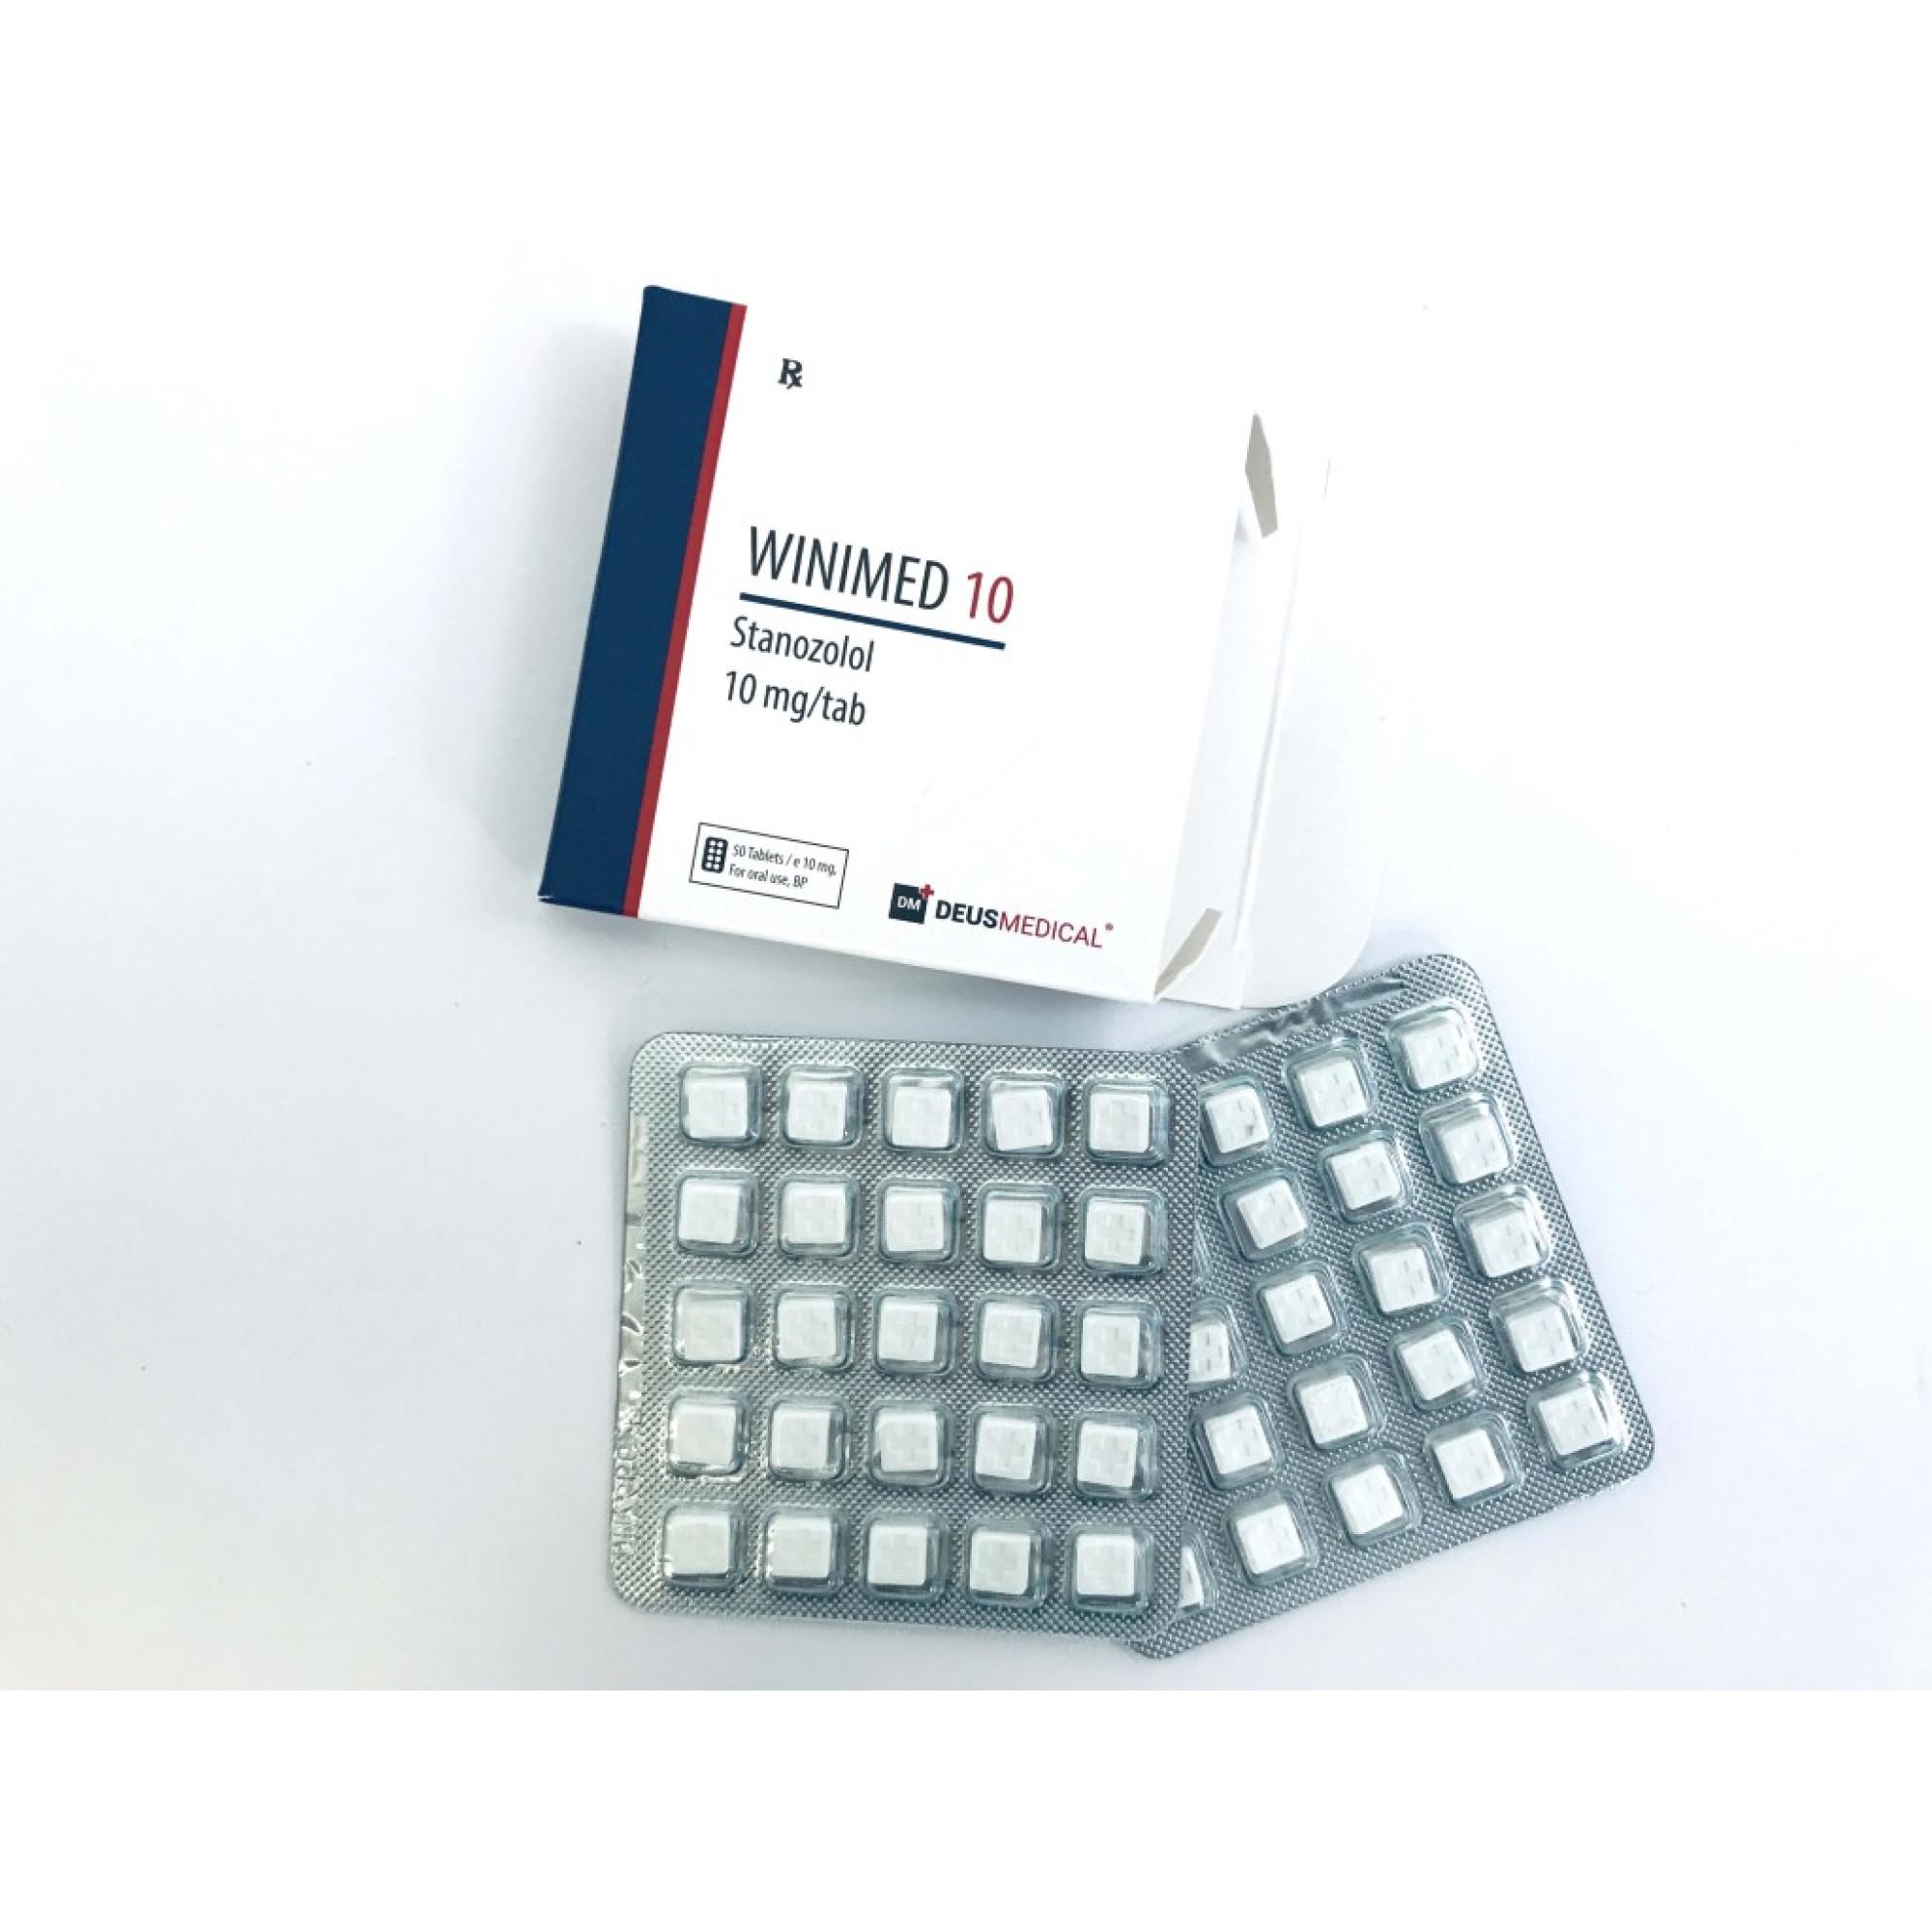 WINIMED 10 (Stanozolol), DEUS MEDICAL, BUY STEROIDS ONLINE - www.DEUSPOWER.com